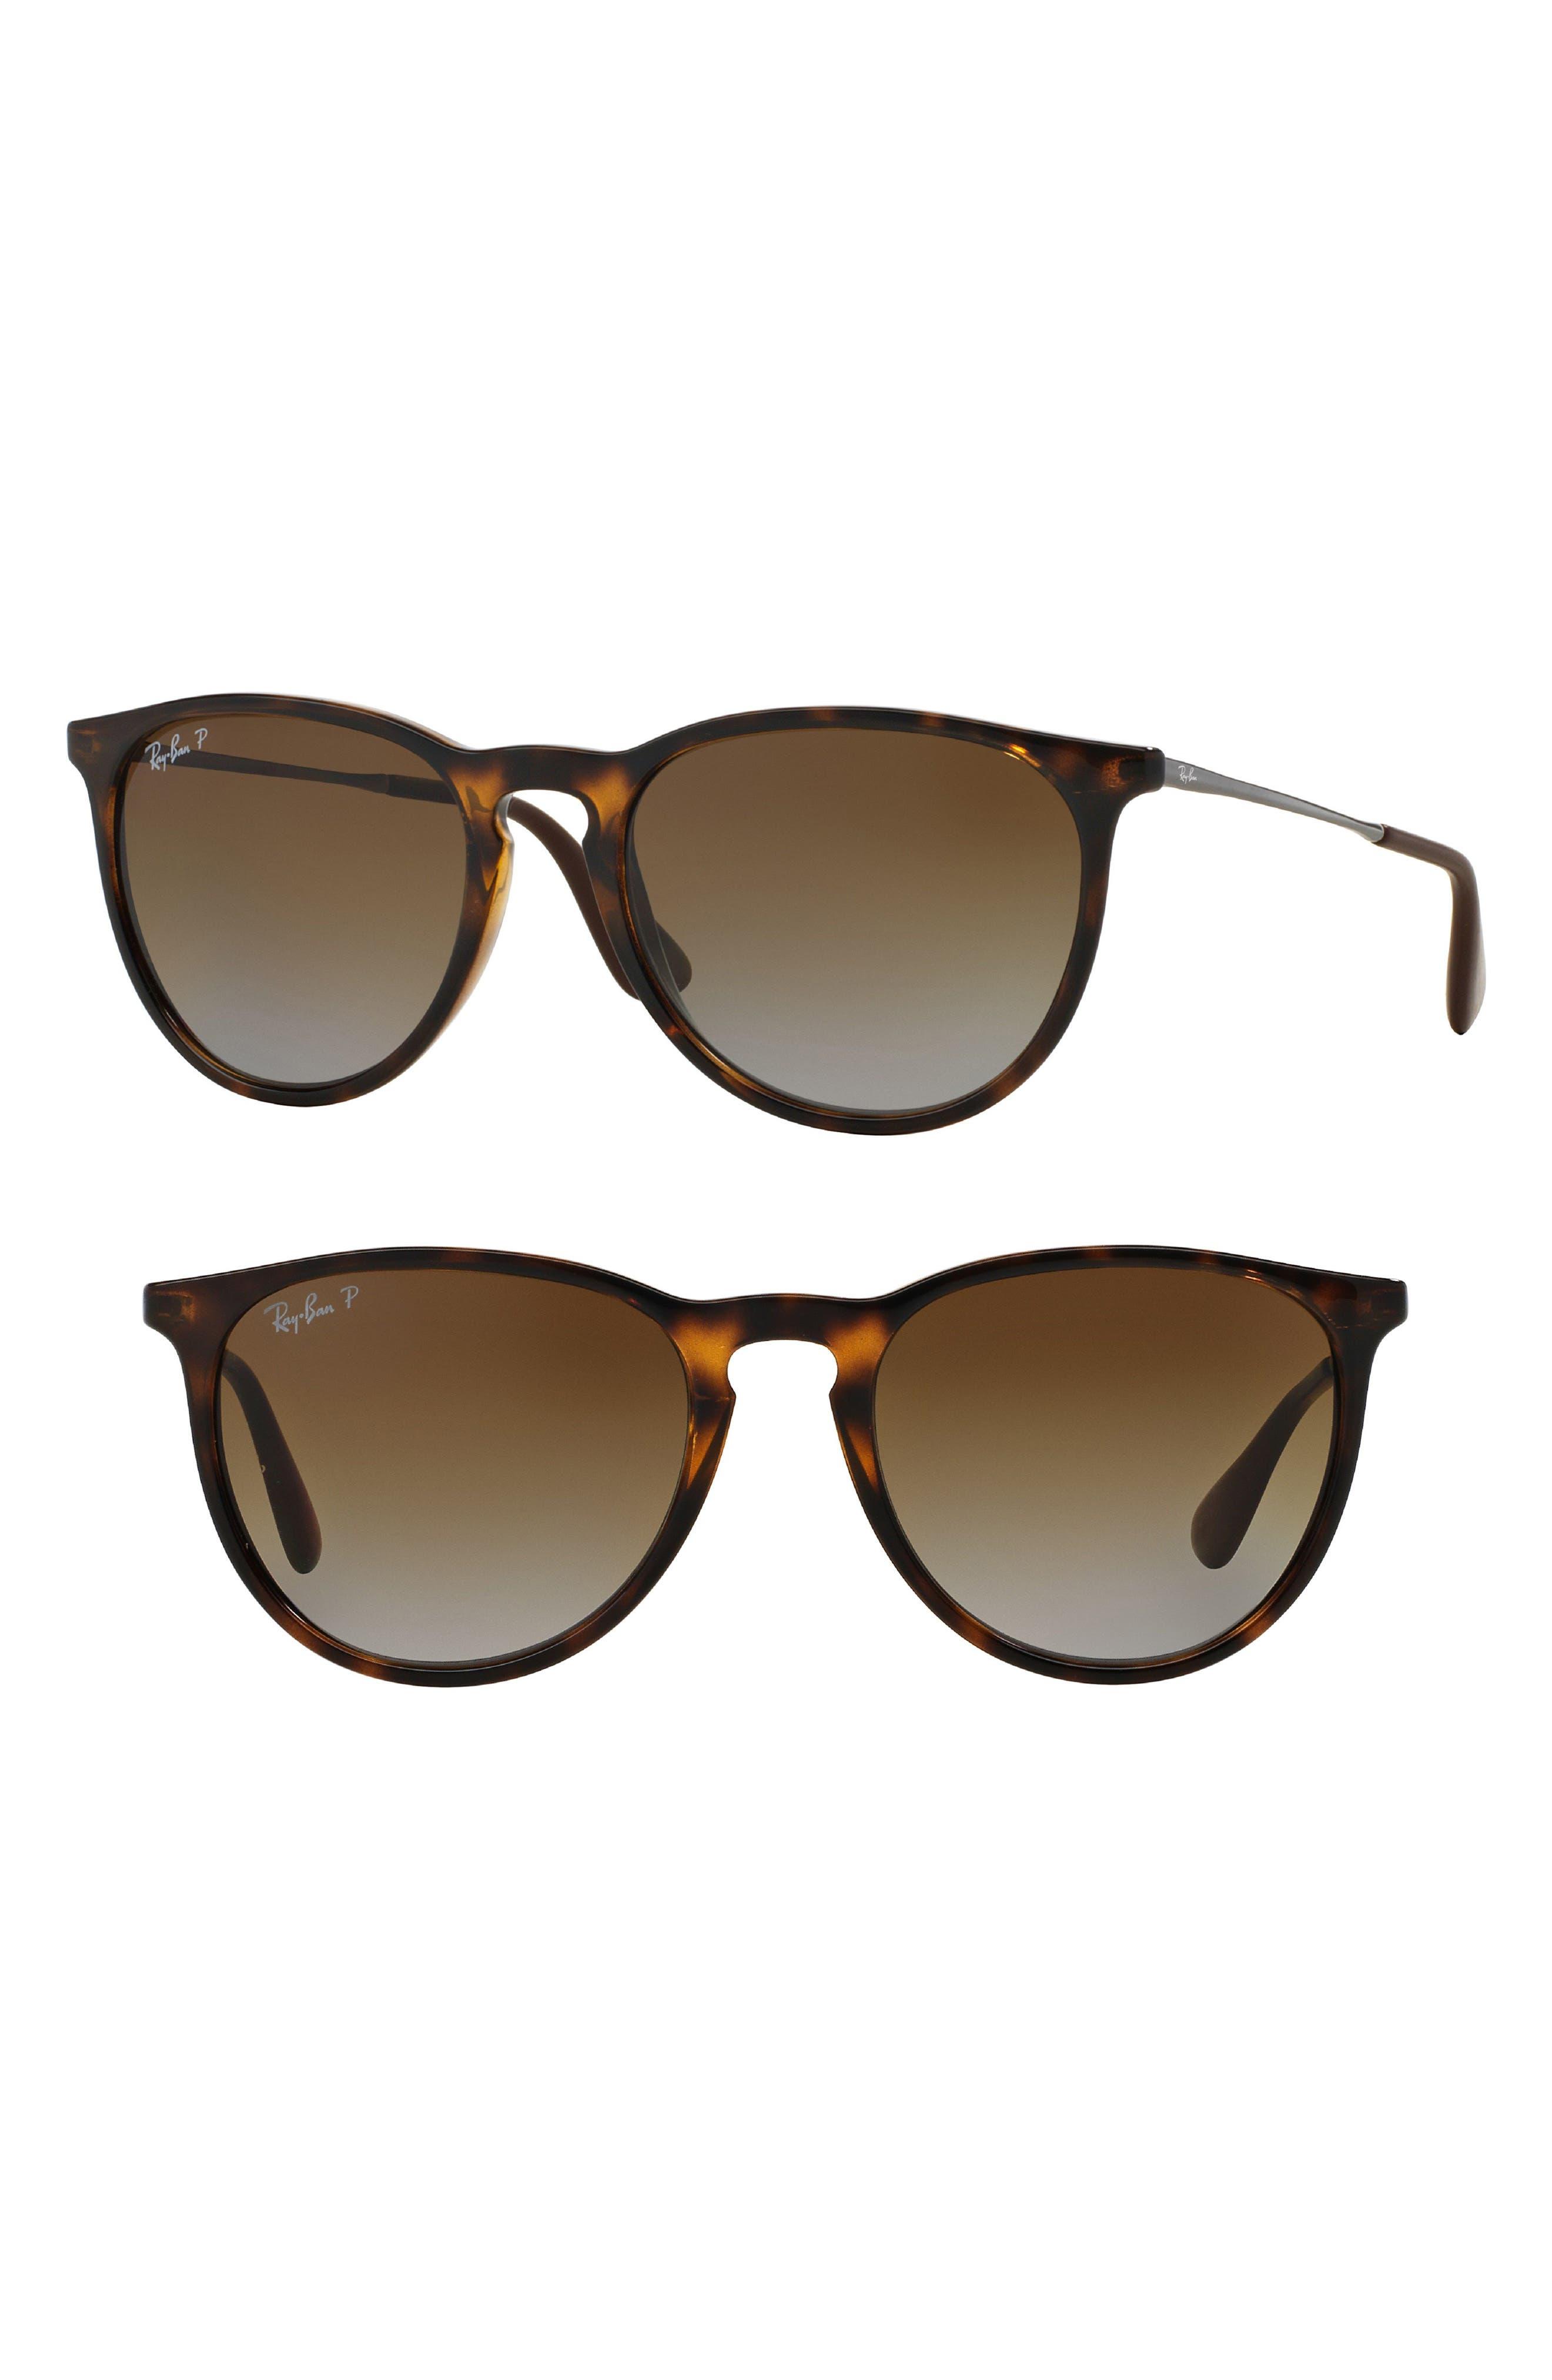 Erika Classic 54mm Sunglasses,                         Main,                         color, HAVANA